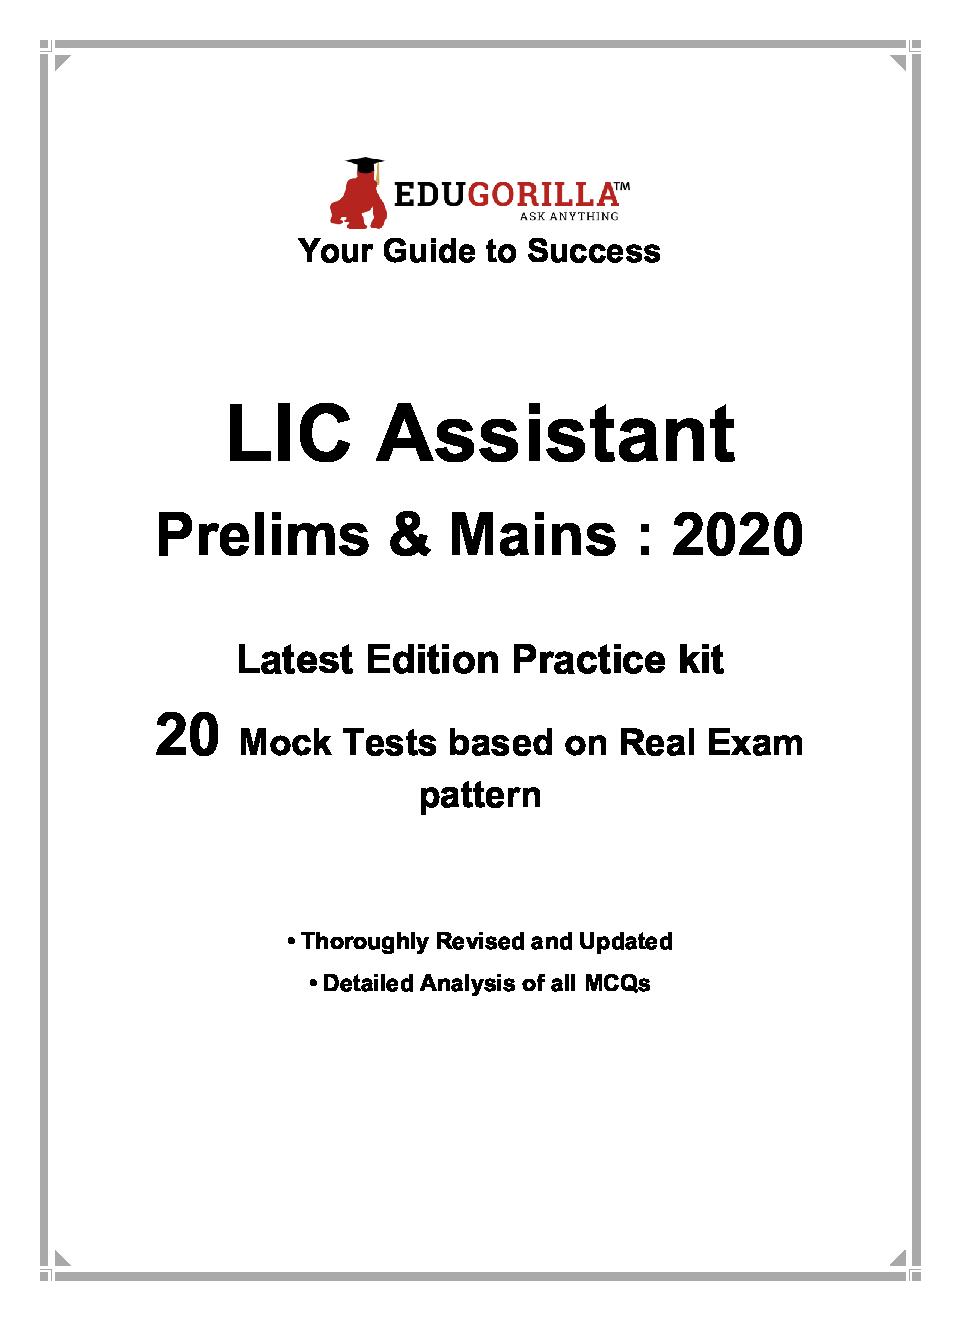 EduGorilla LIC Assistant Prelims & Mains Exam 2020 | 20 Mock Test - Page 3